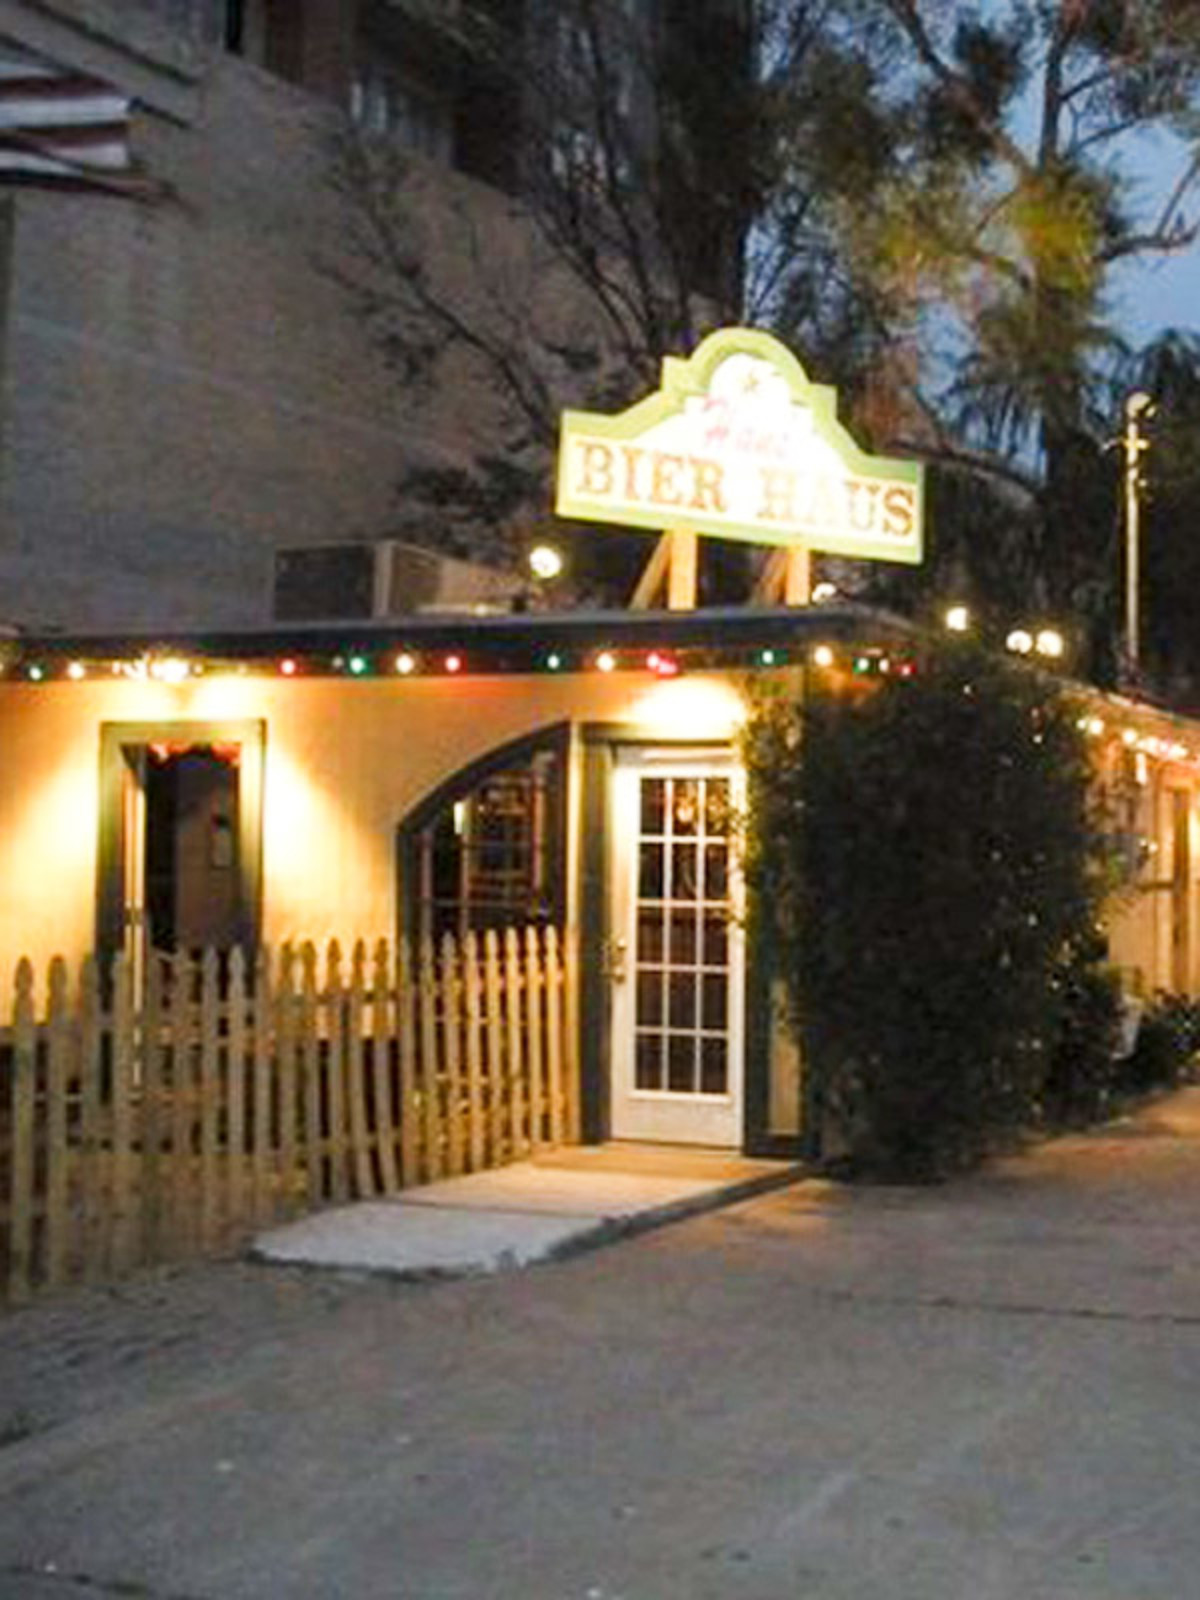 Places_Drinks_Hans' Bier Haus_exterior_night